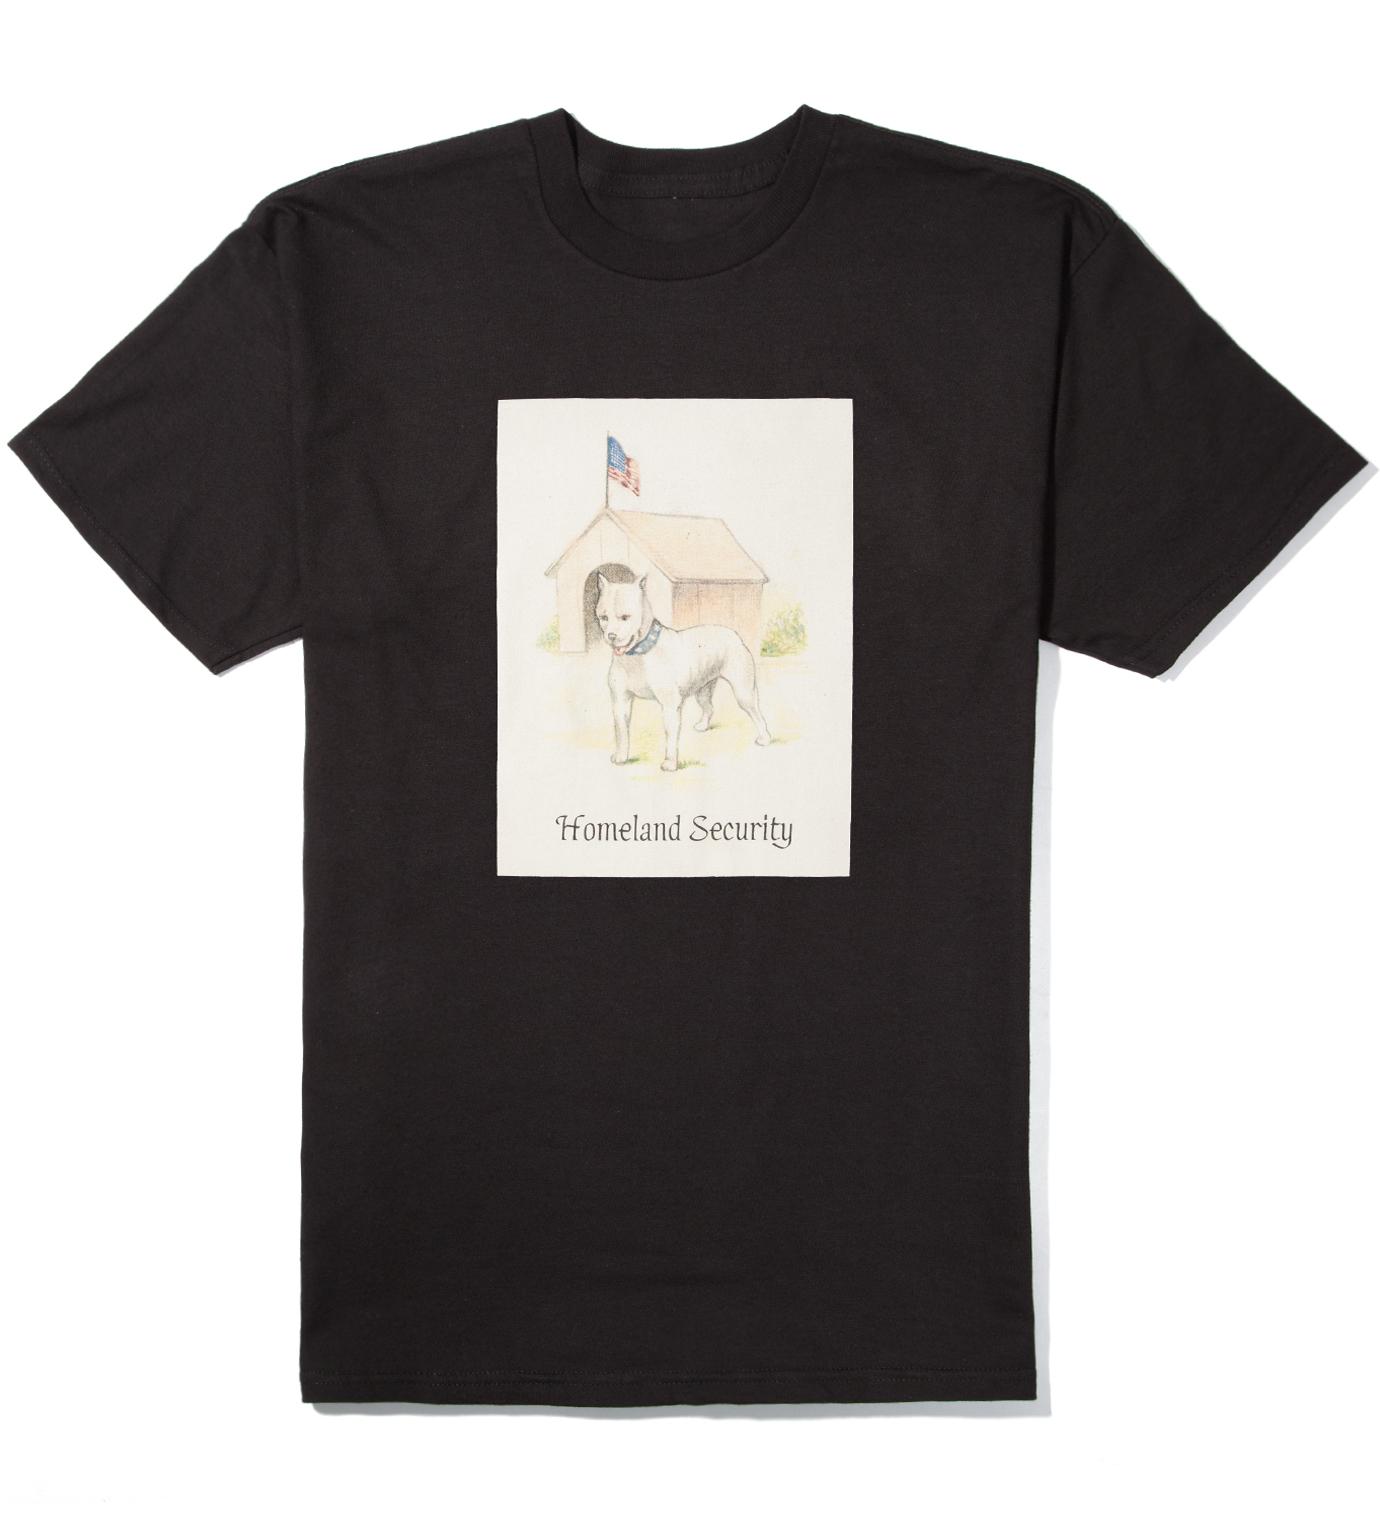 FUCT Black Homeland Security T-Shirt